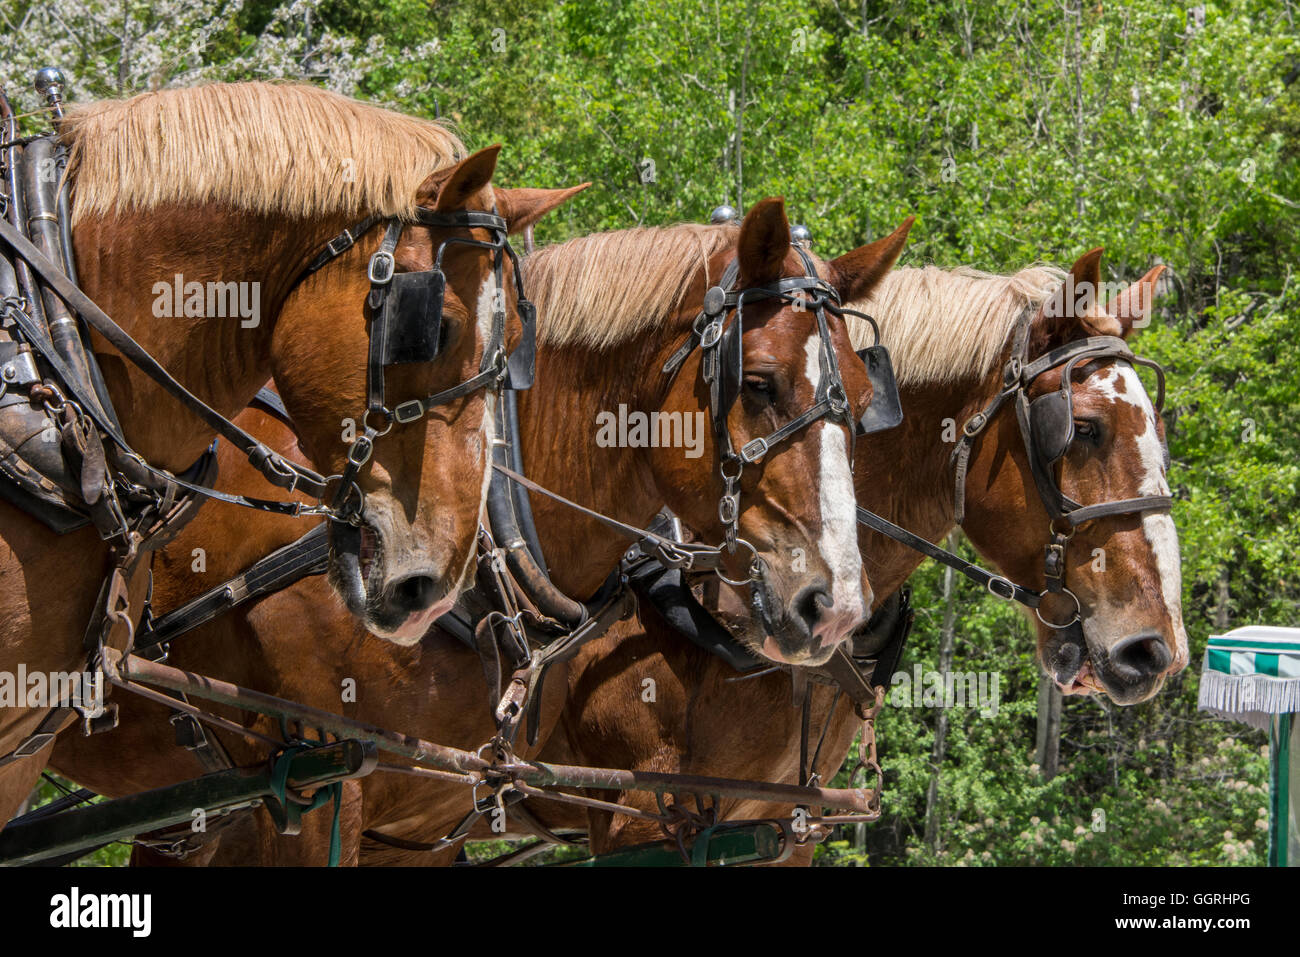 Michigan, Mackinac Island. Three sorrel horse carriage team. Stock Photo